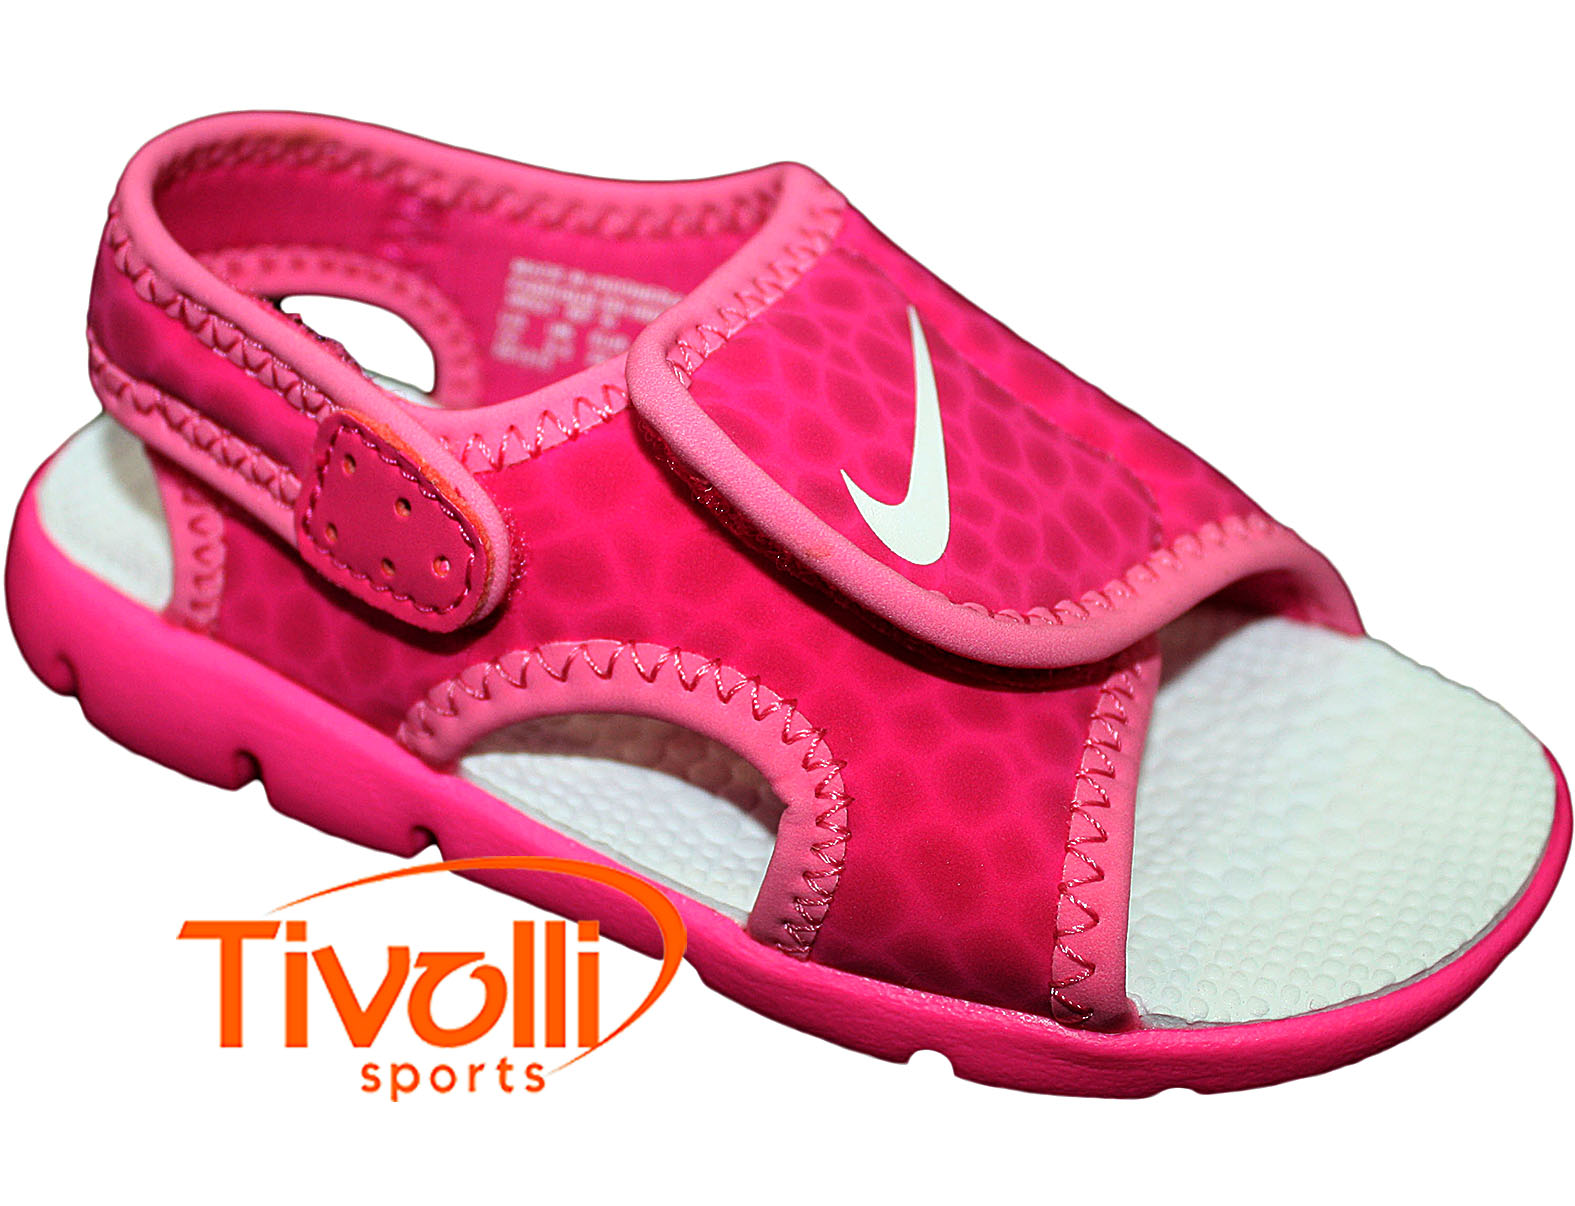 Sandália Nike Sunray Adjust 4 (PS GS) 27 ao 33 infantil rosa pink e branca 2615b9833638f